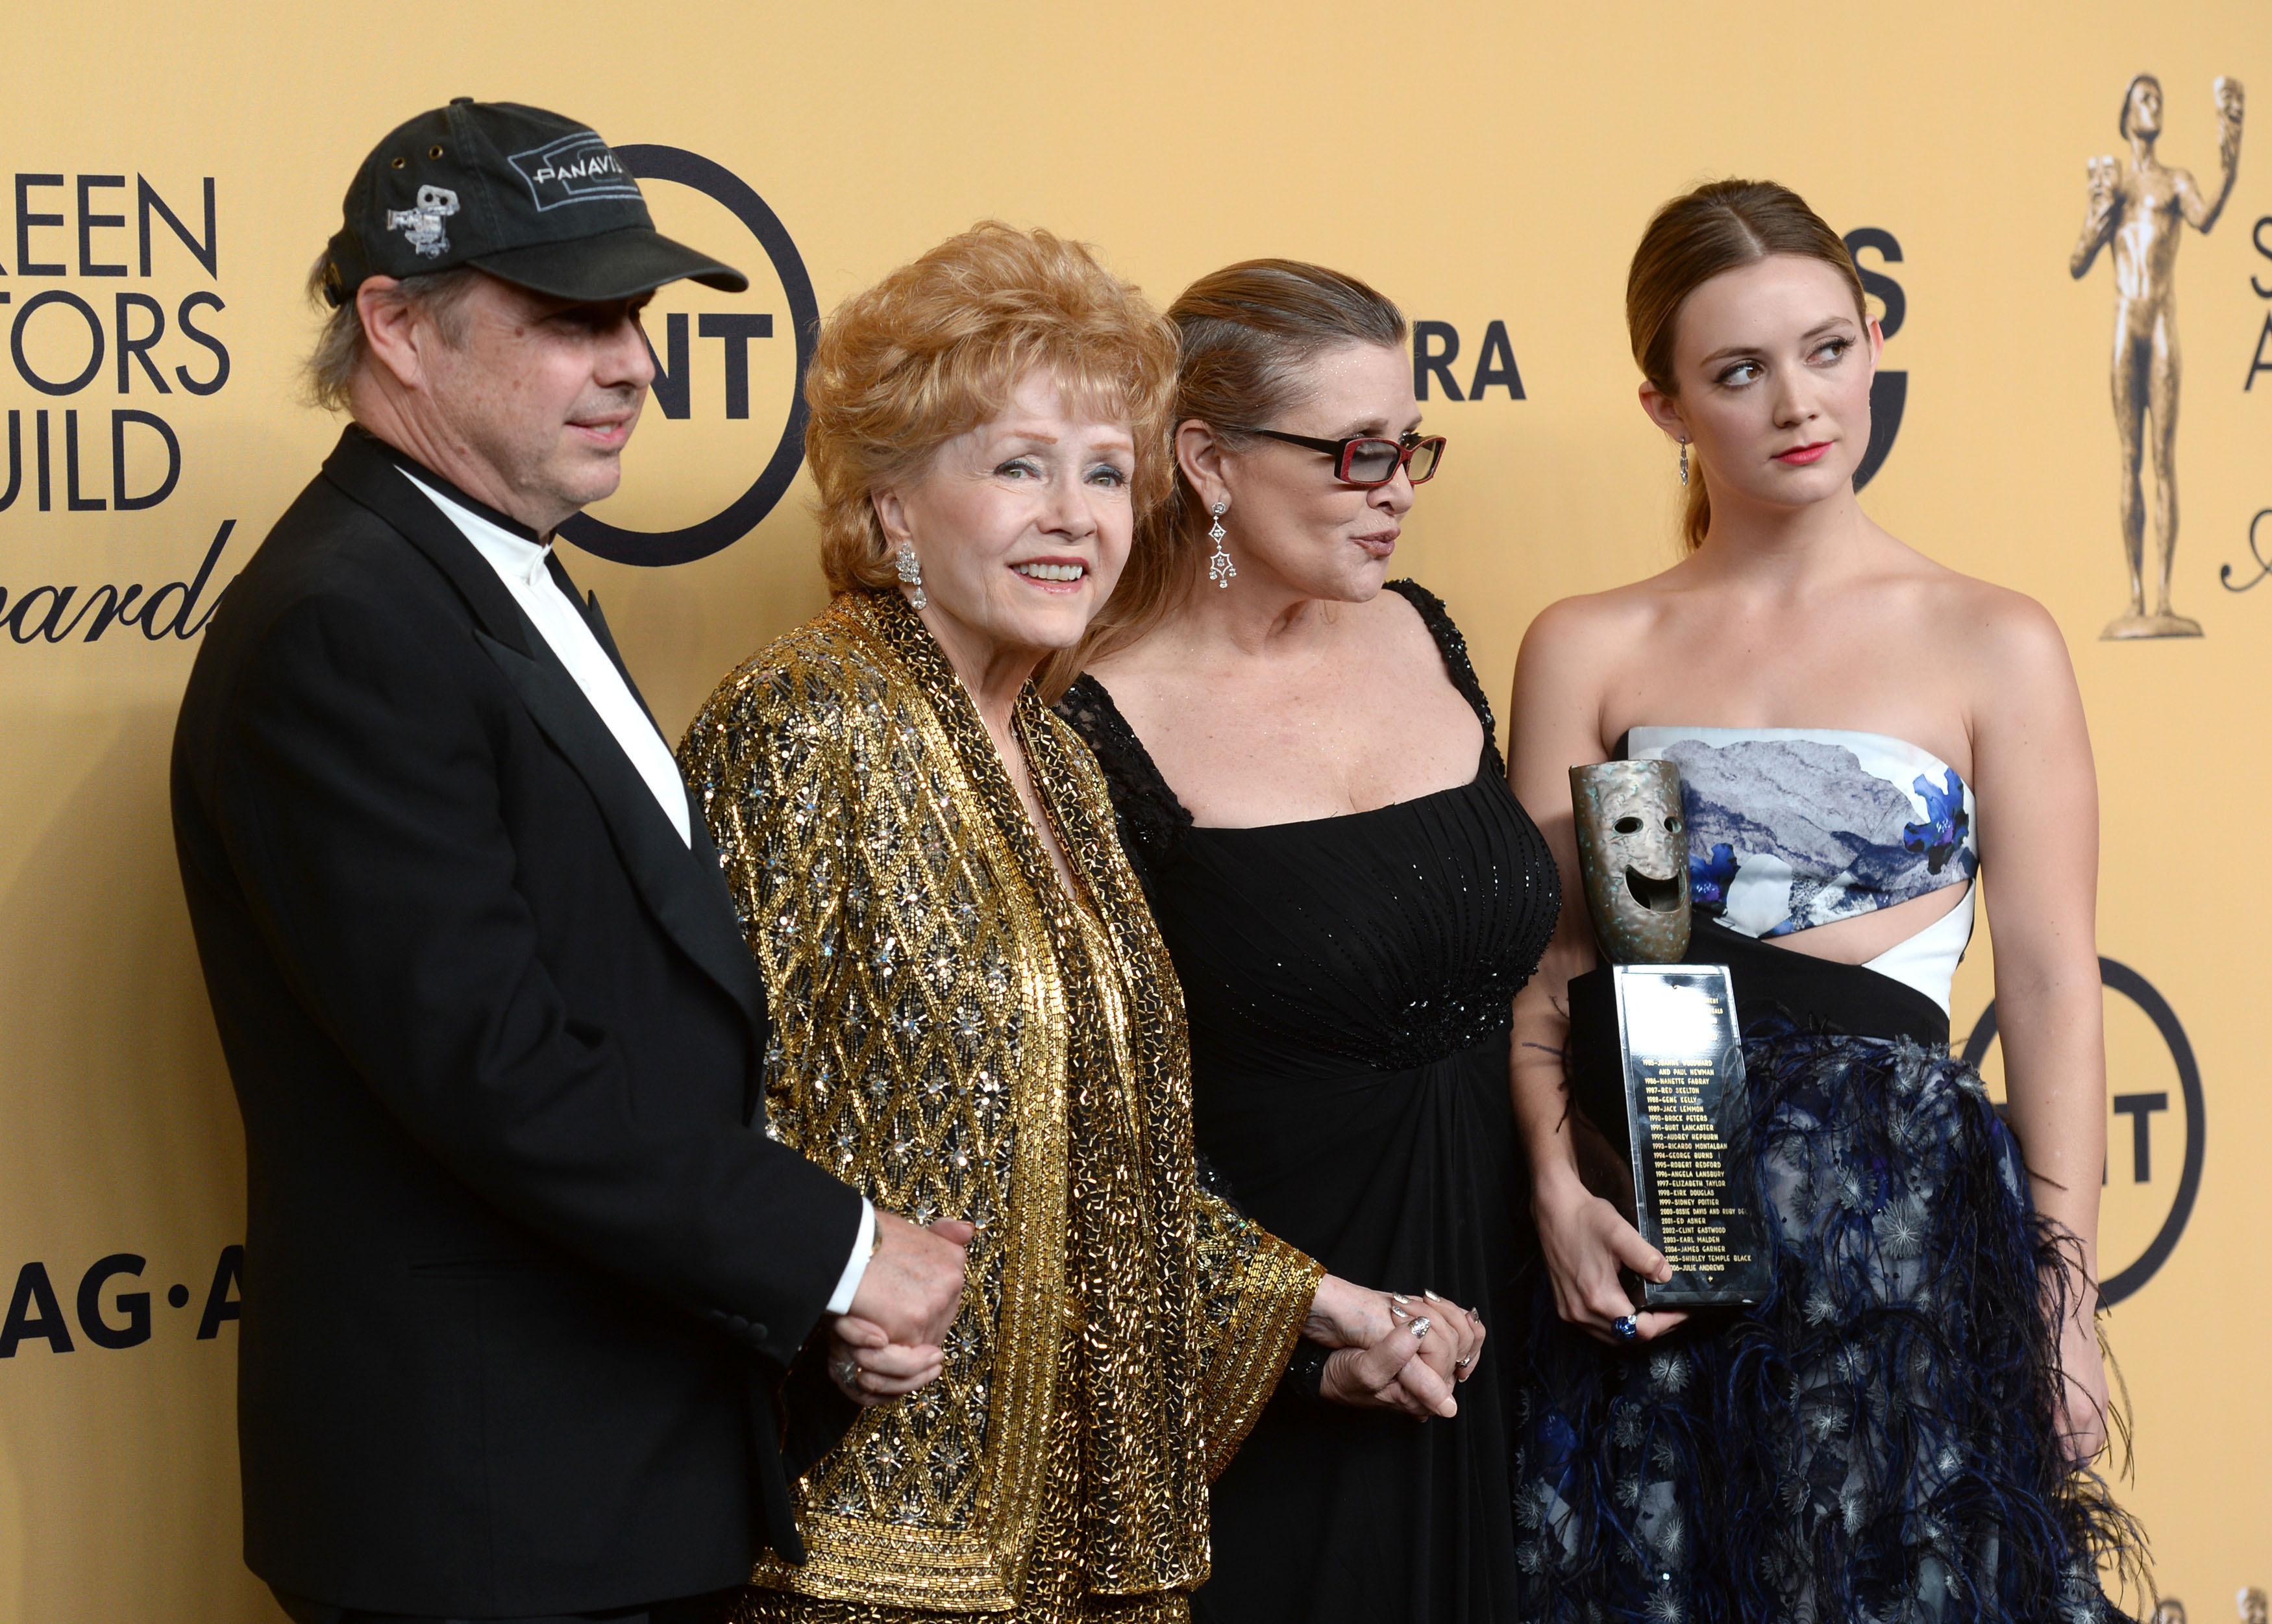 Todd Fisher, Debbie Reynolds, Carrie Fisher, Billi